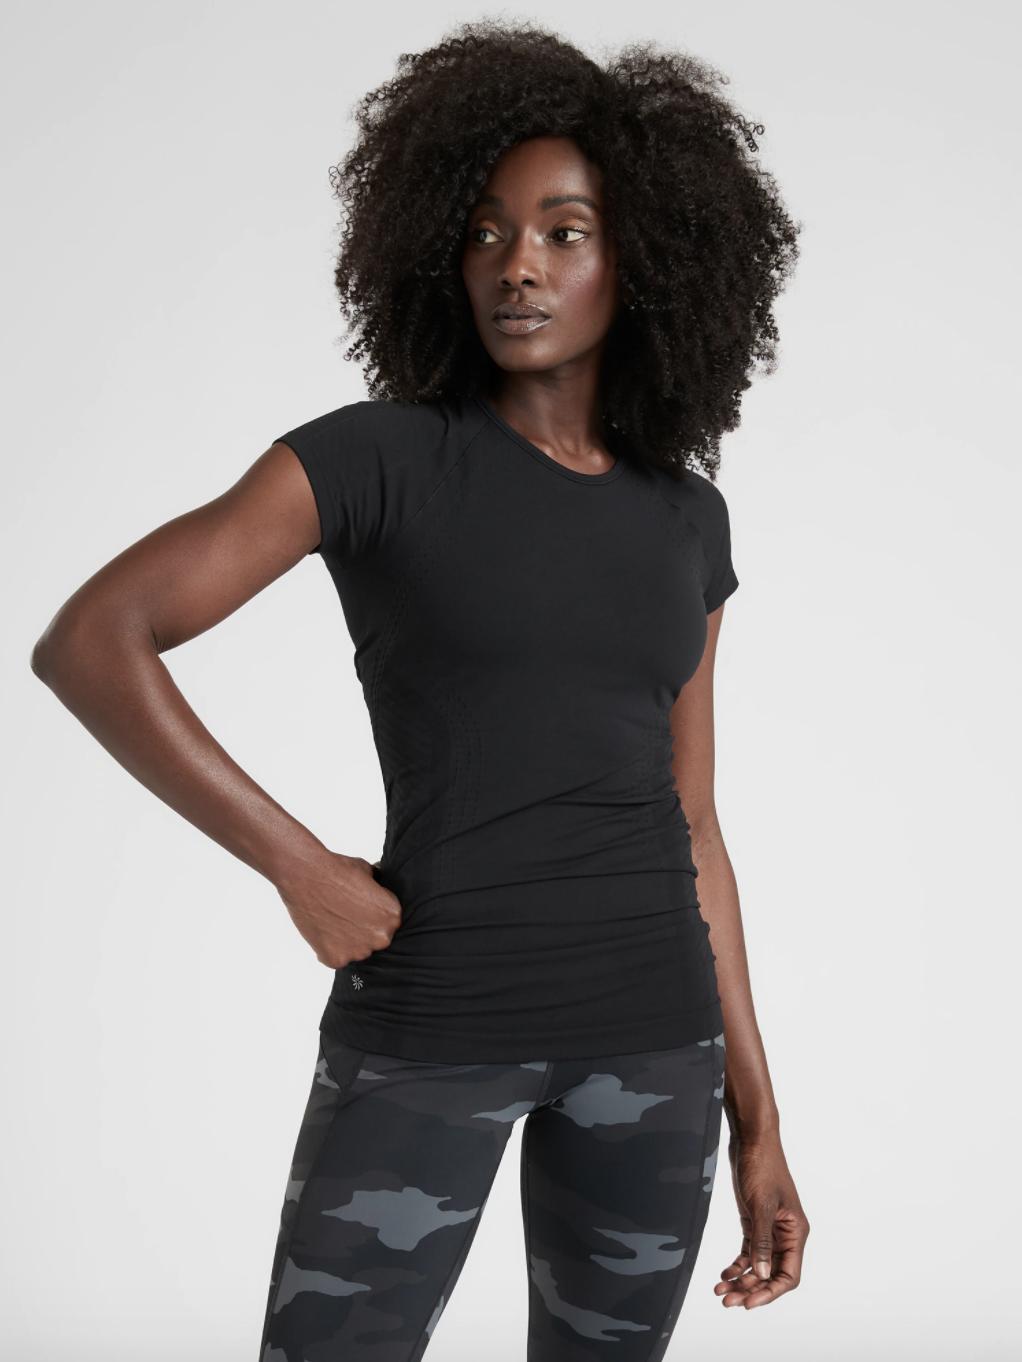 A model wearing the shirt